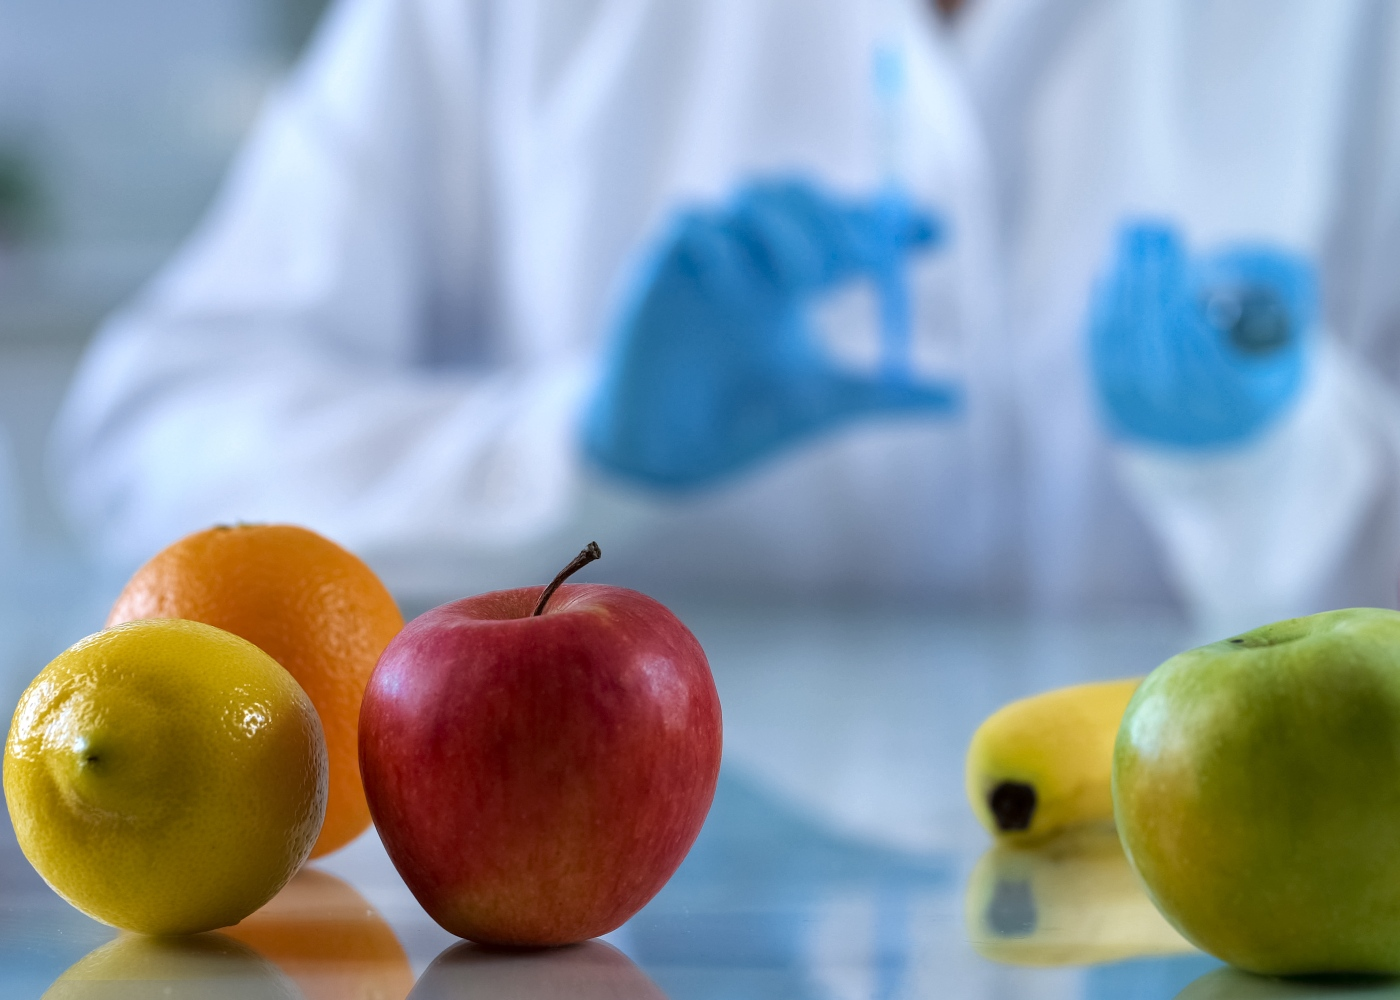 Alimentos modificados geneticamente: exemplos de frutas e legumes